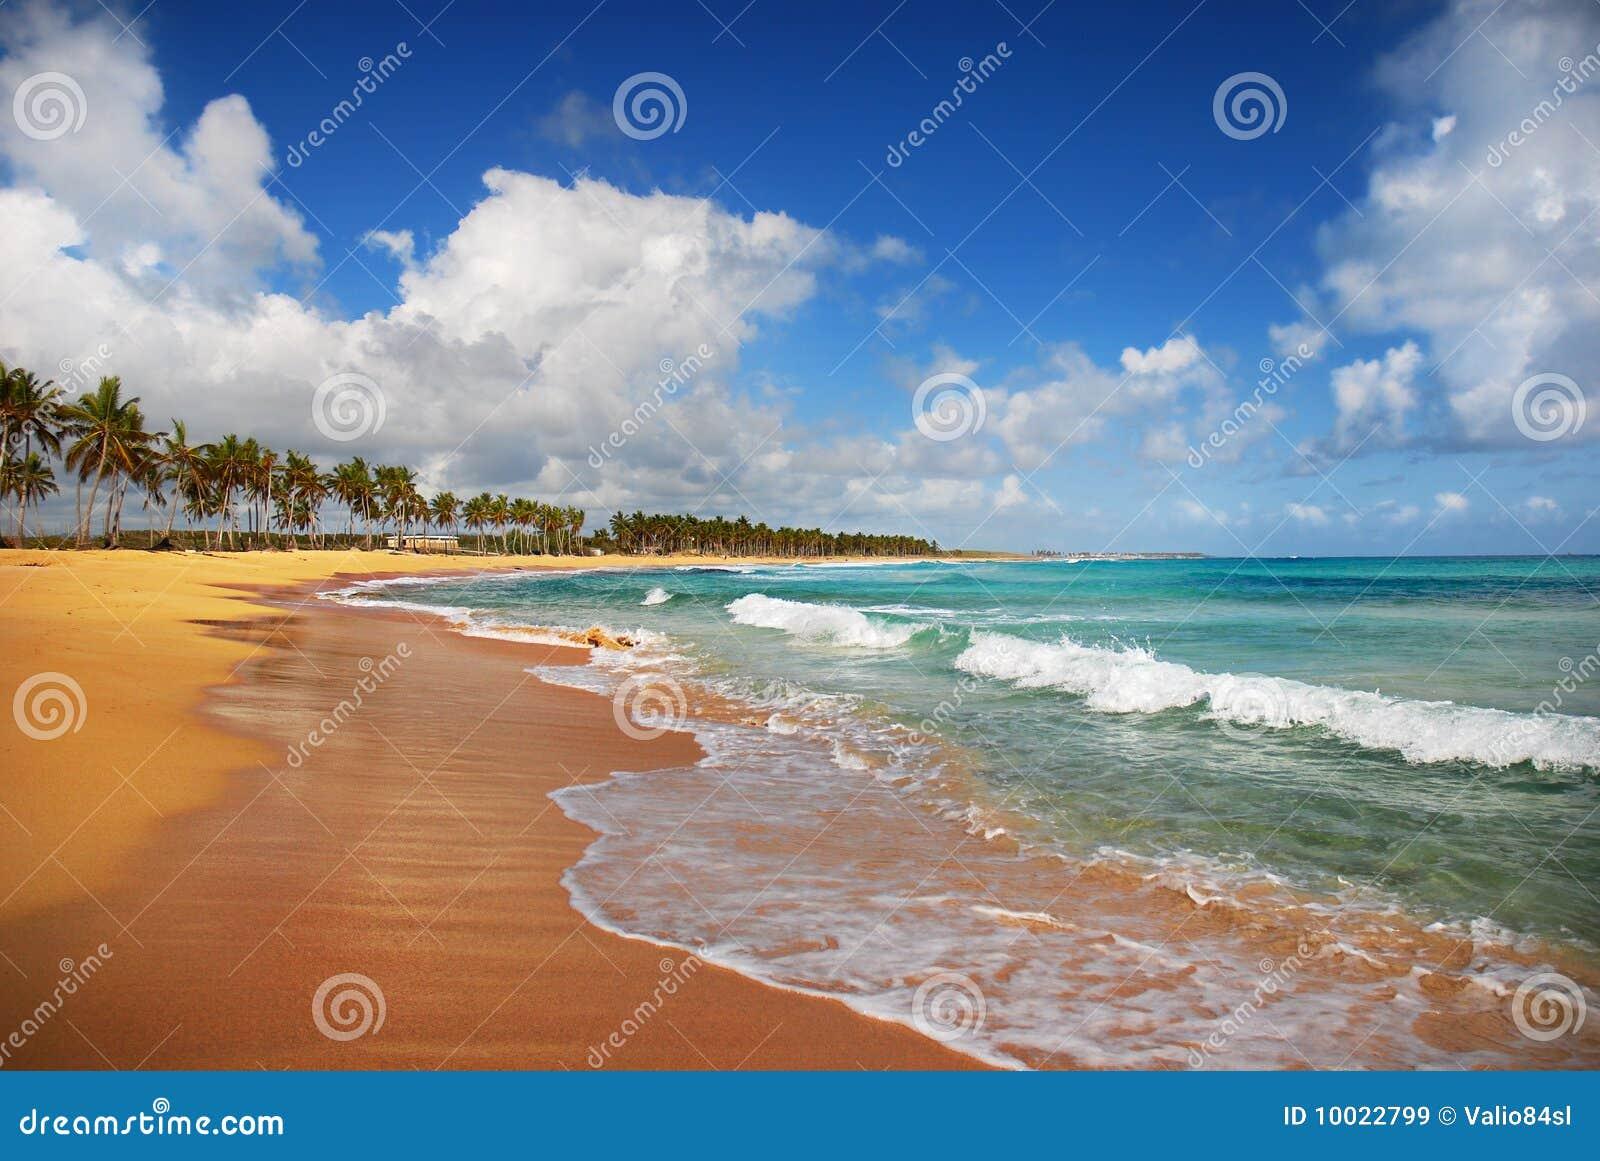 Exotic Beach in Punta cana